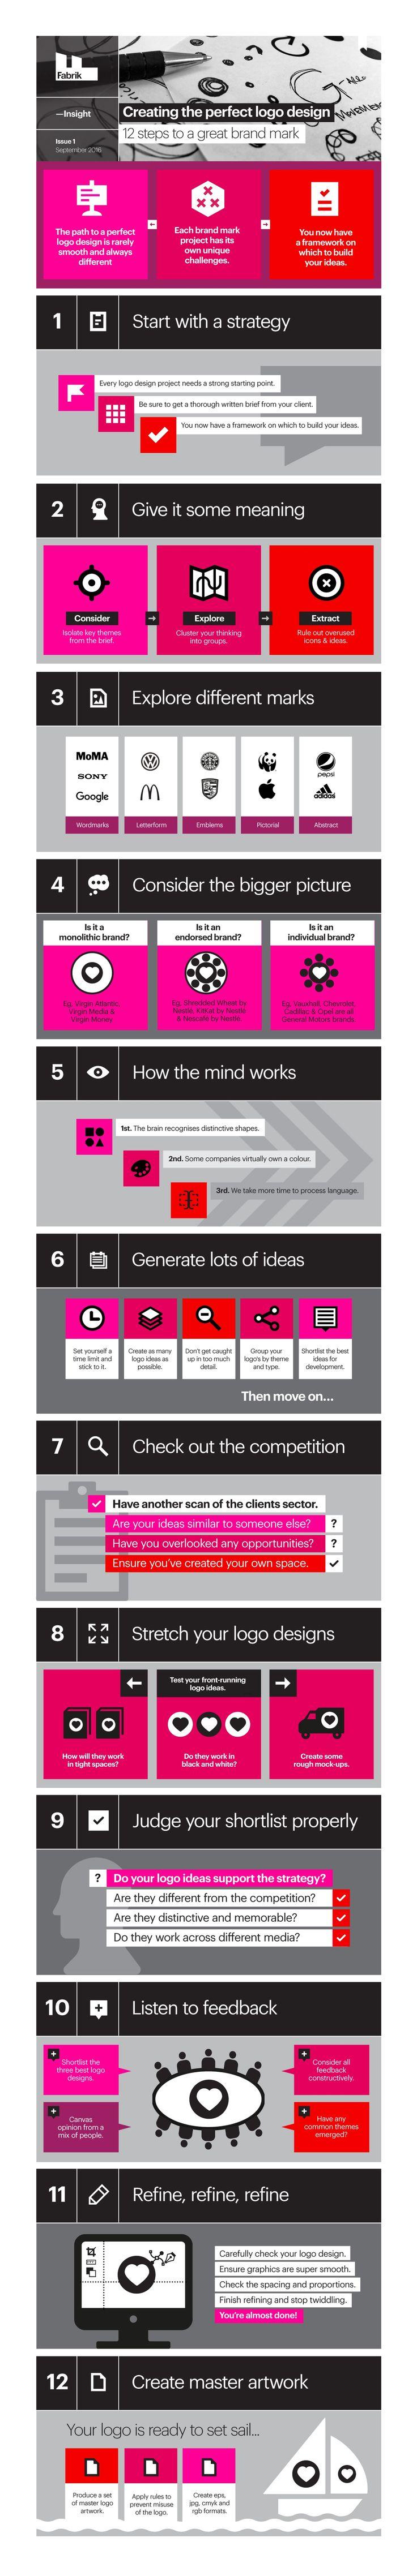 Cassandra cappello graphic design toronto - Creating The Perfect Logo Design Infographic